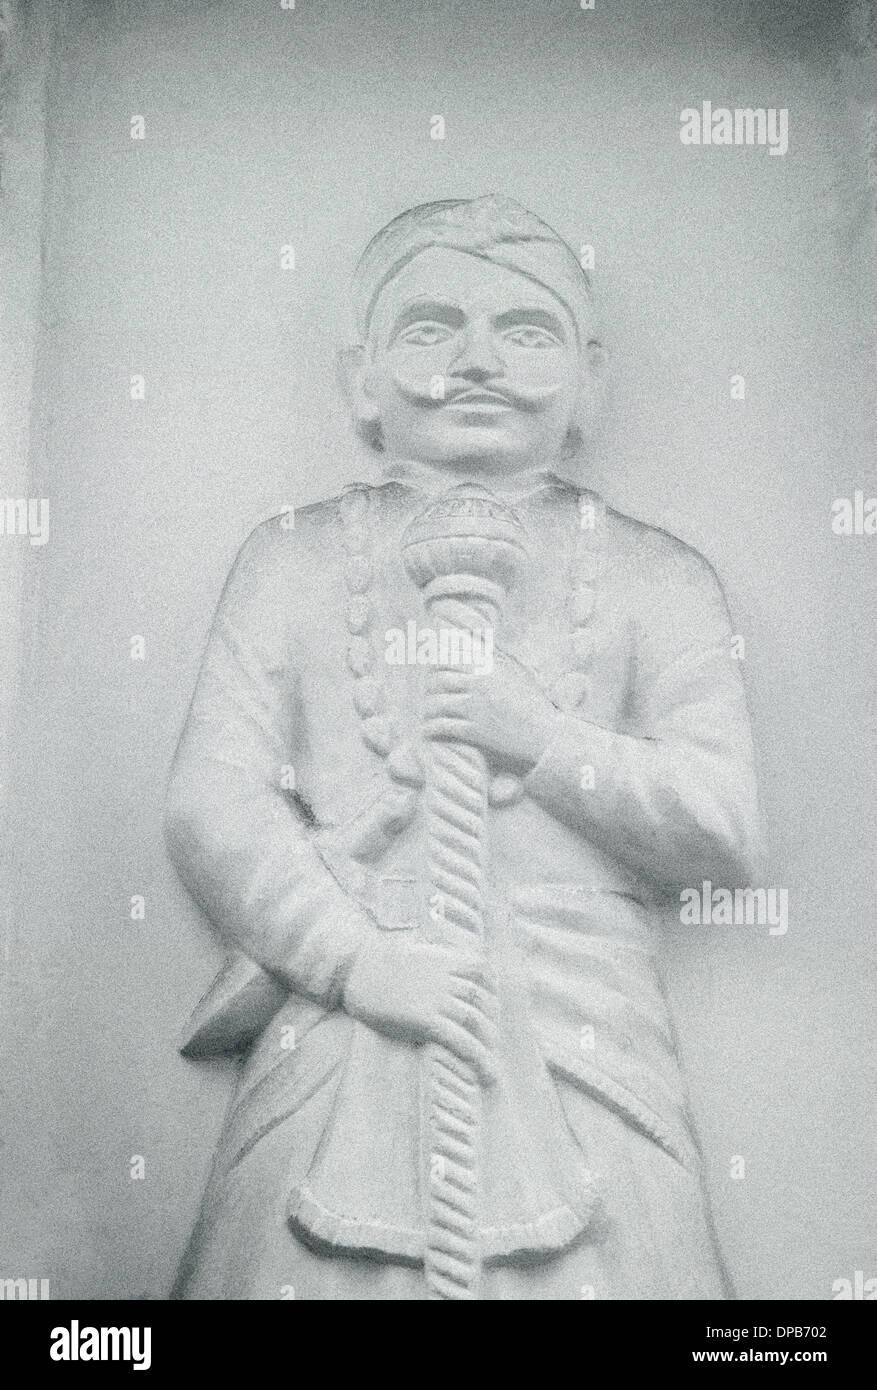 Scultura in Udaipur nel Rajasthan in India in Asia del Sud. Uomo di Rajasthani guerriero Carving scultura Rajput Travel Wanderlust Immagini Stock